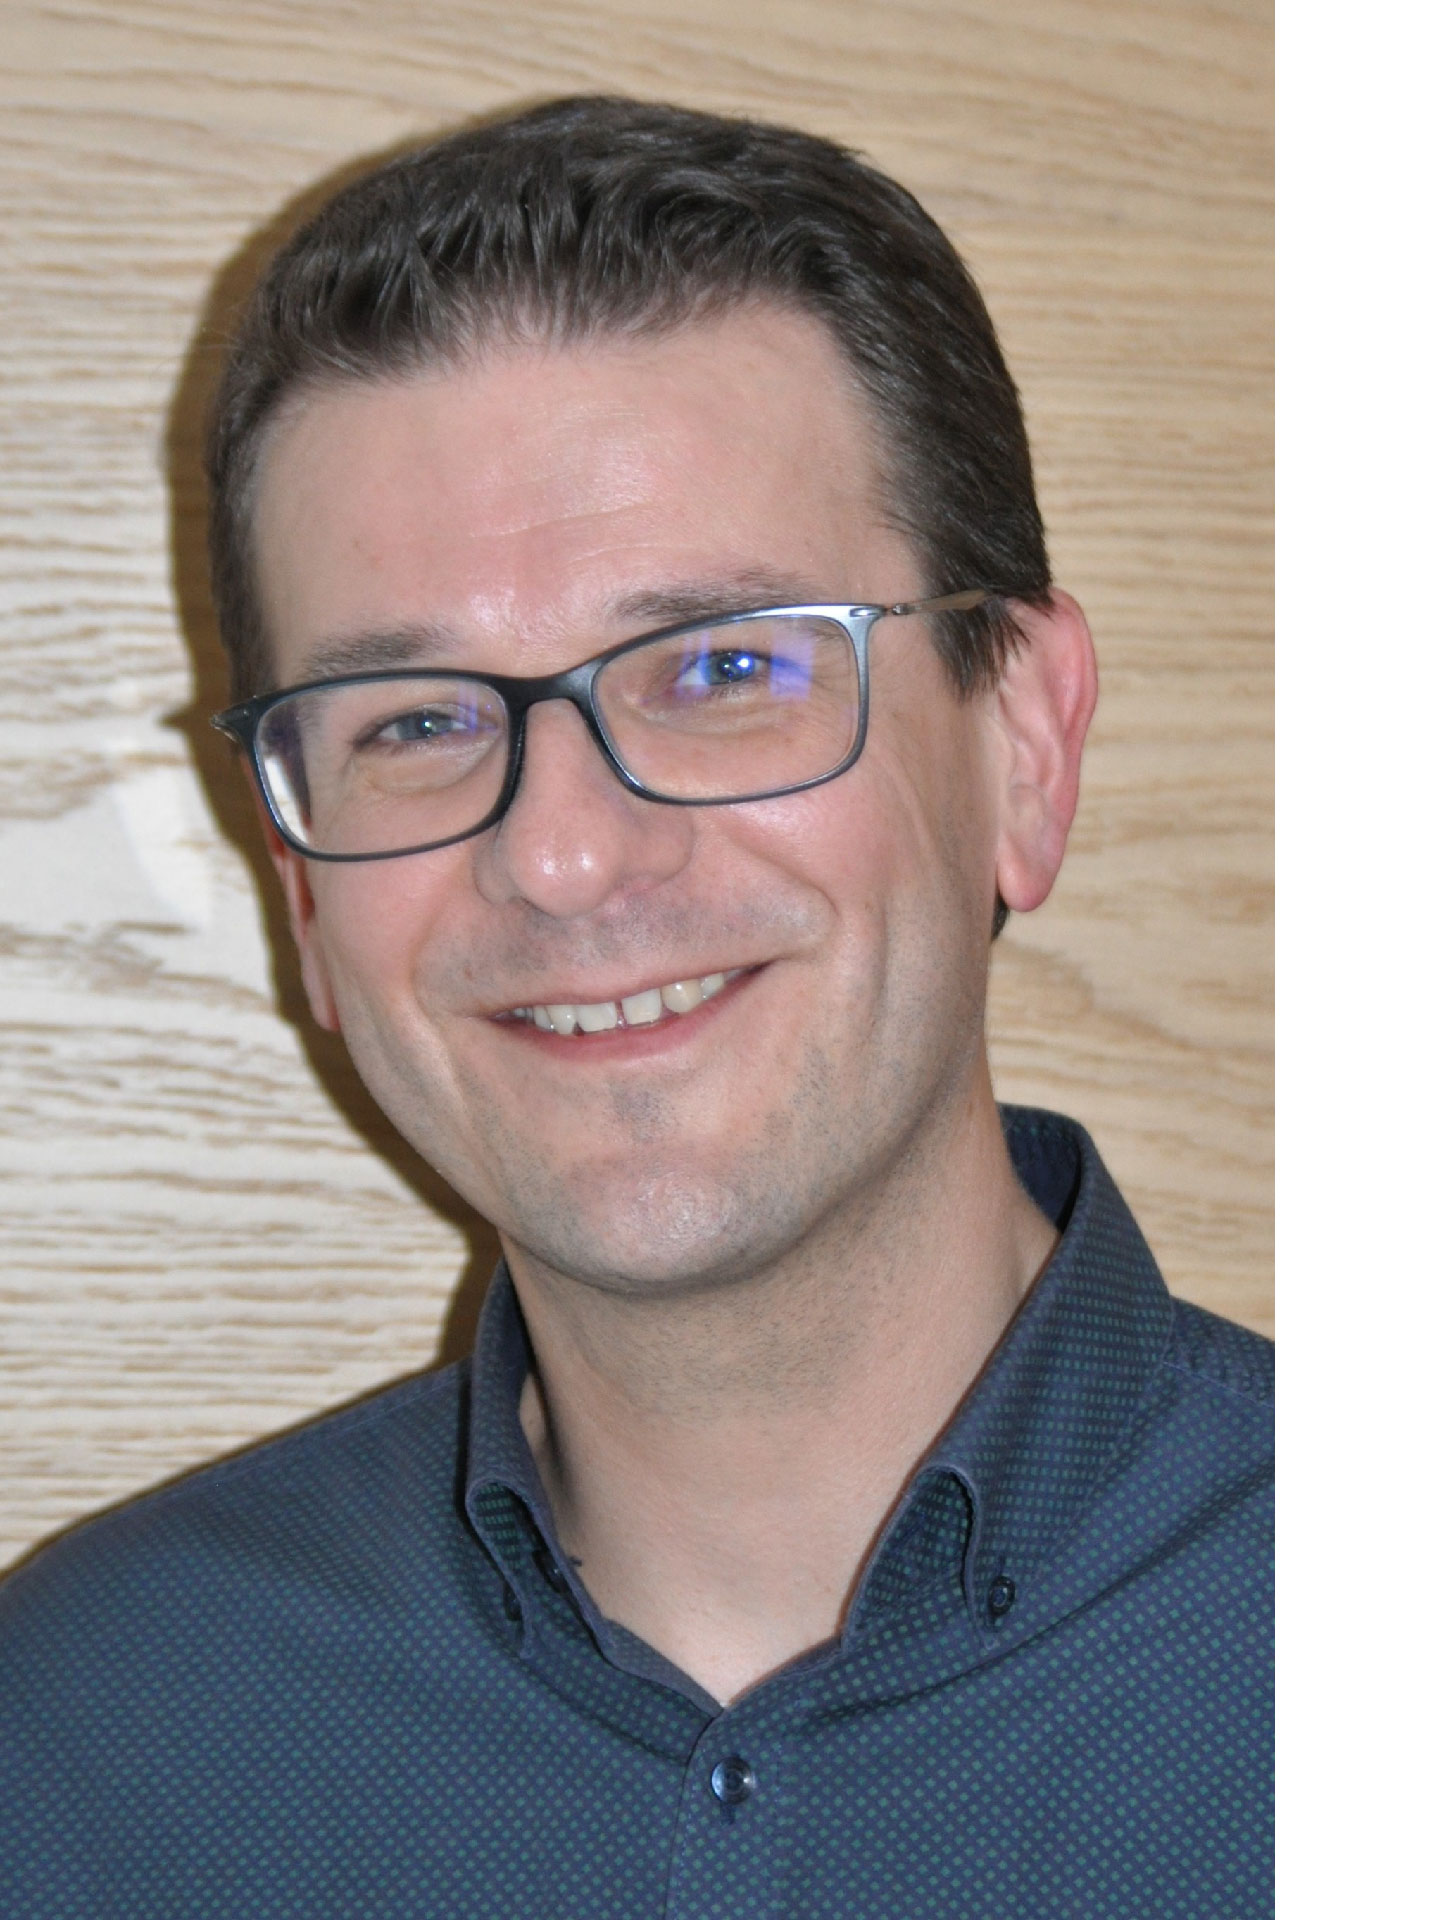 Dr-Richard-Friewald-Internist-Lilienfeld-Endoskopie-Kariologie-Innere-Medizin-Ordination